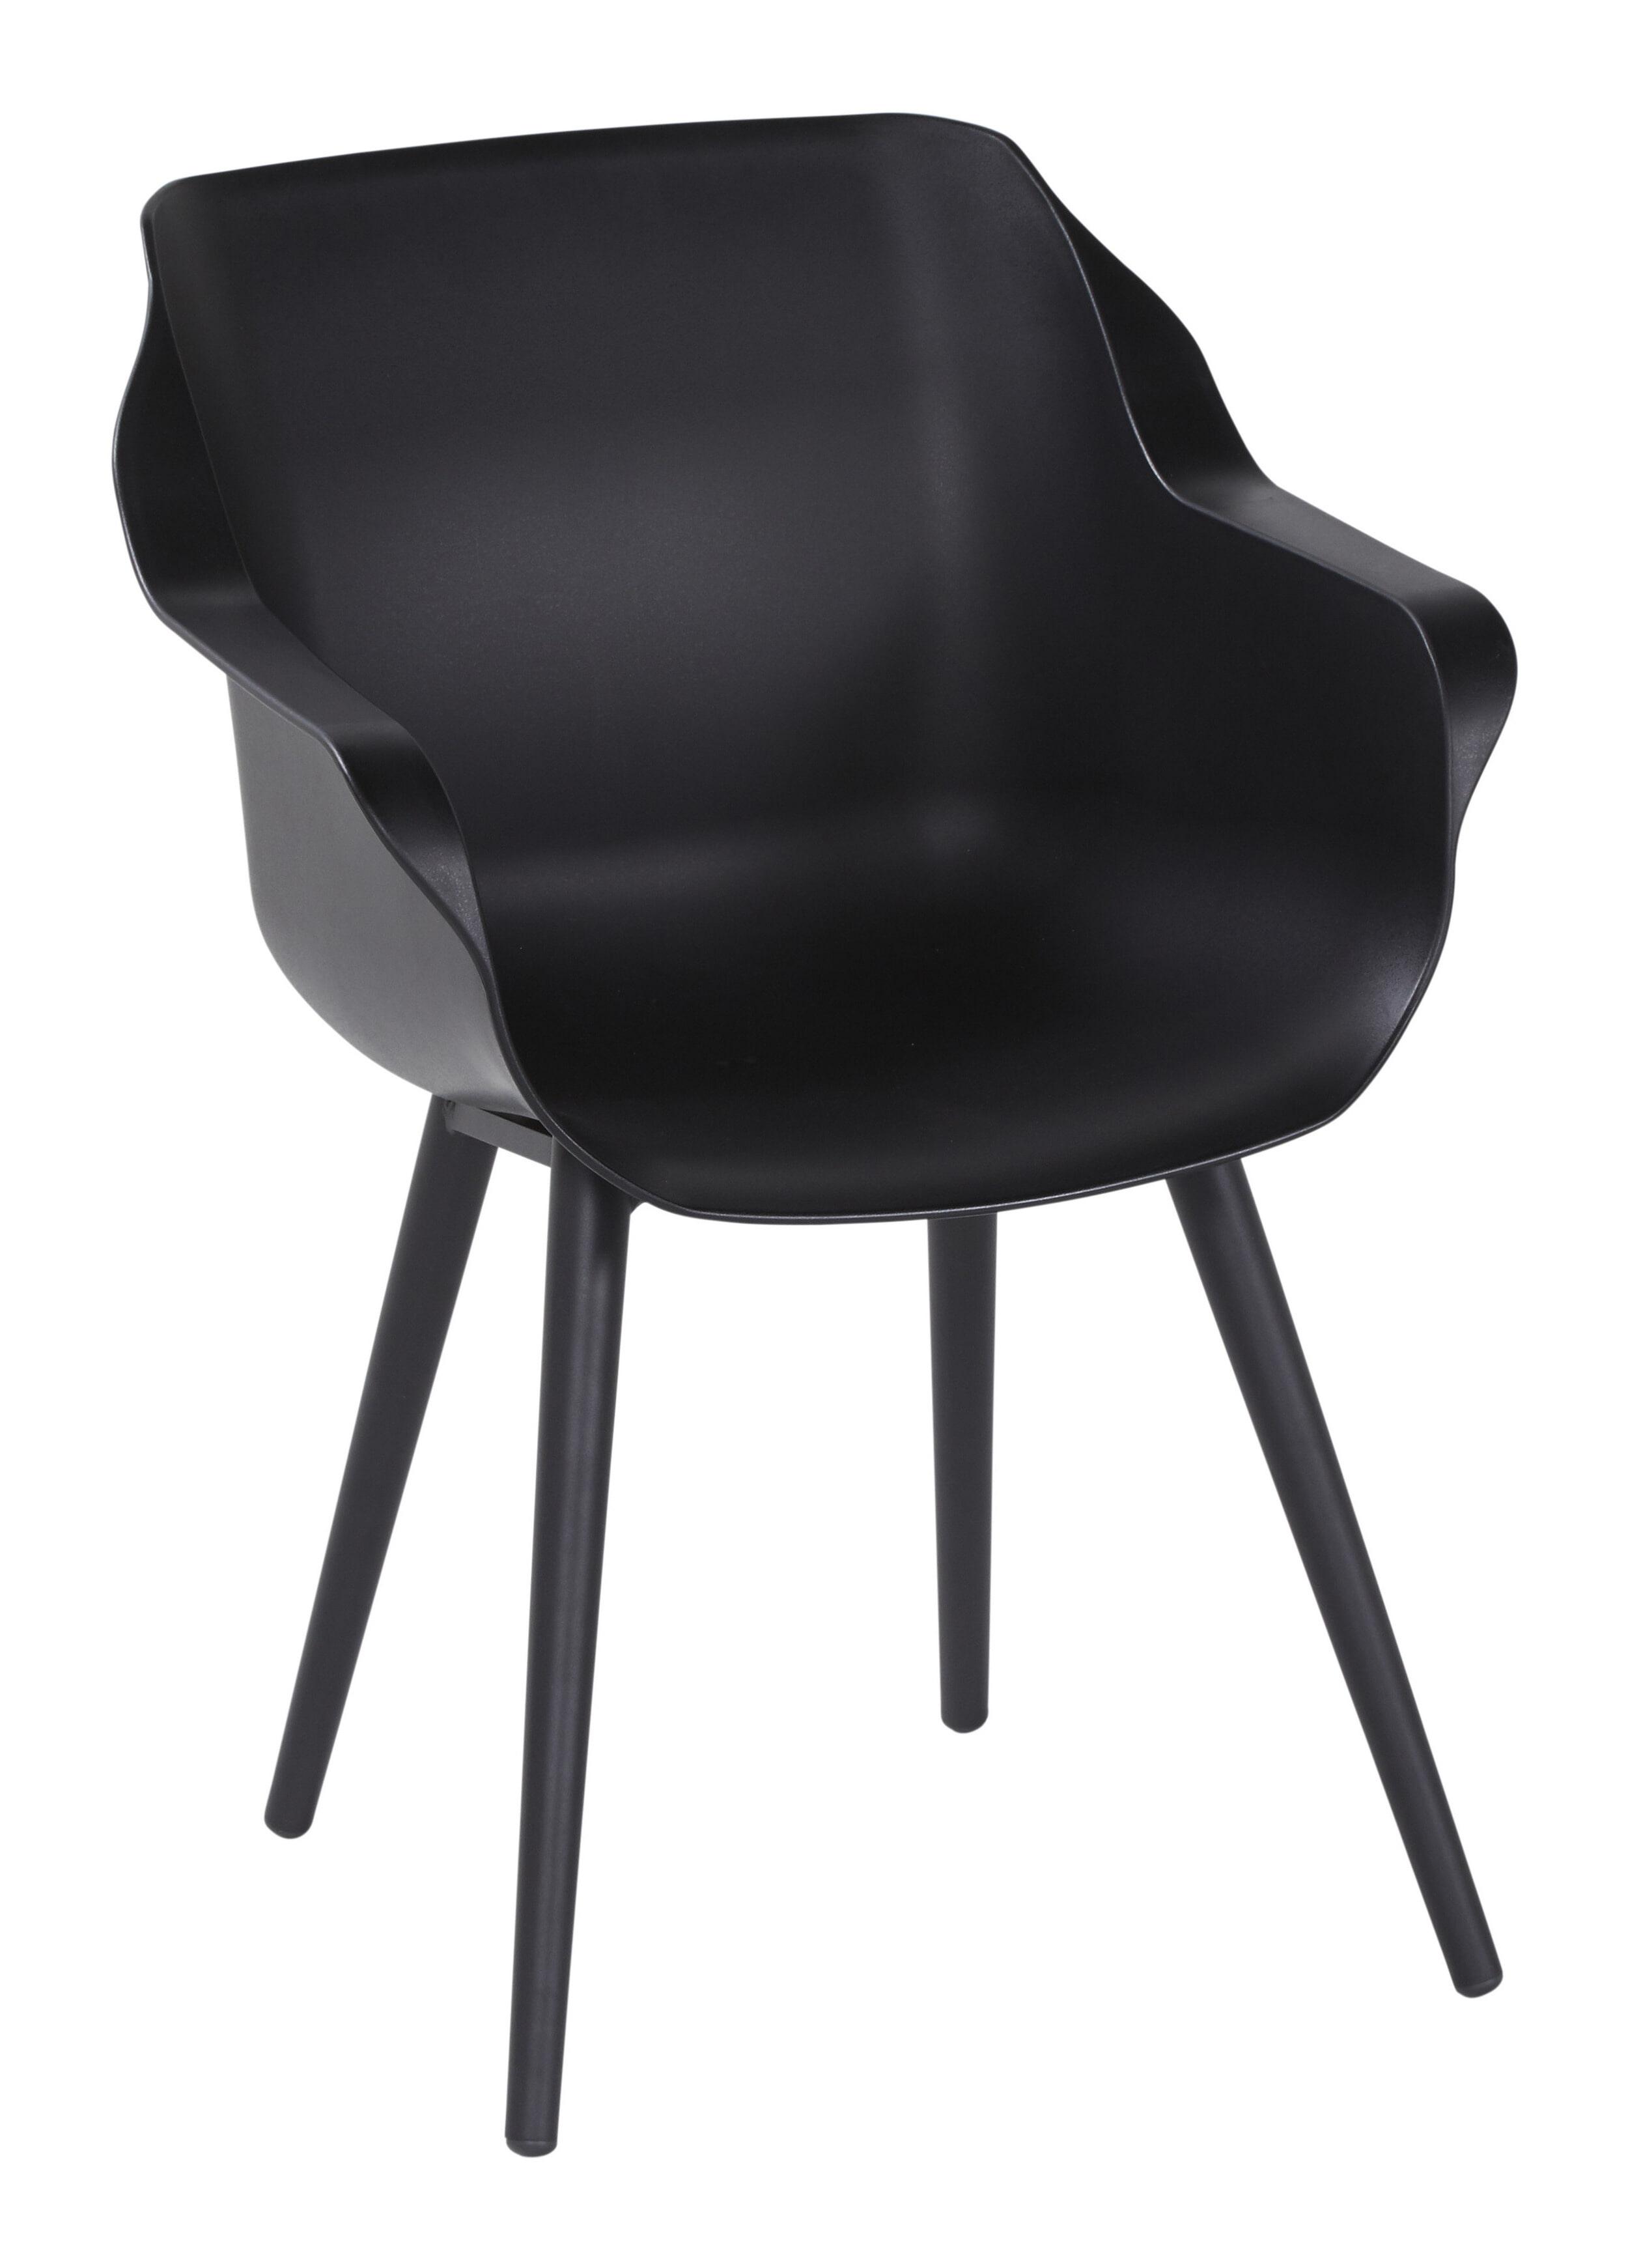 Hartman Tuinstoel 'Sophie Studio' met armleuning, kleur Zwart